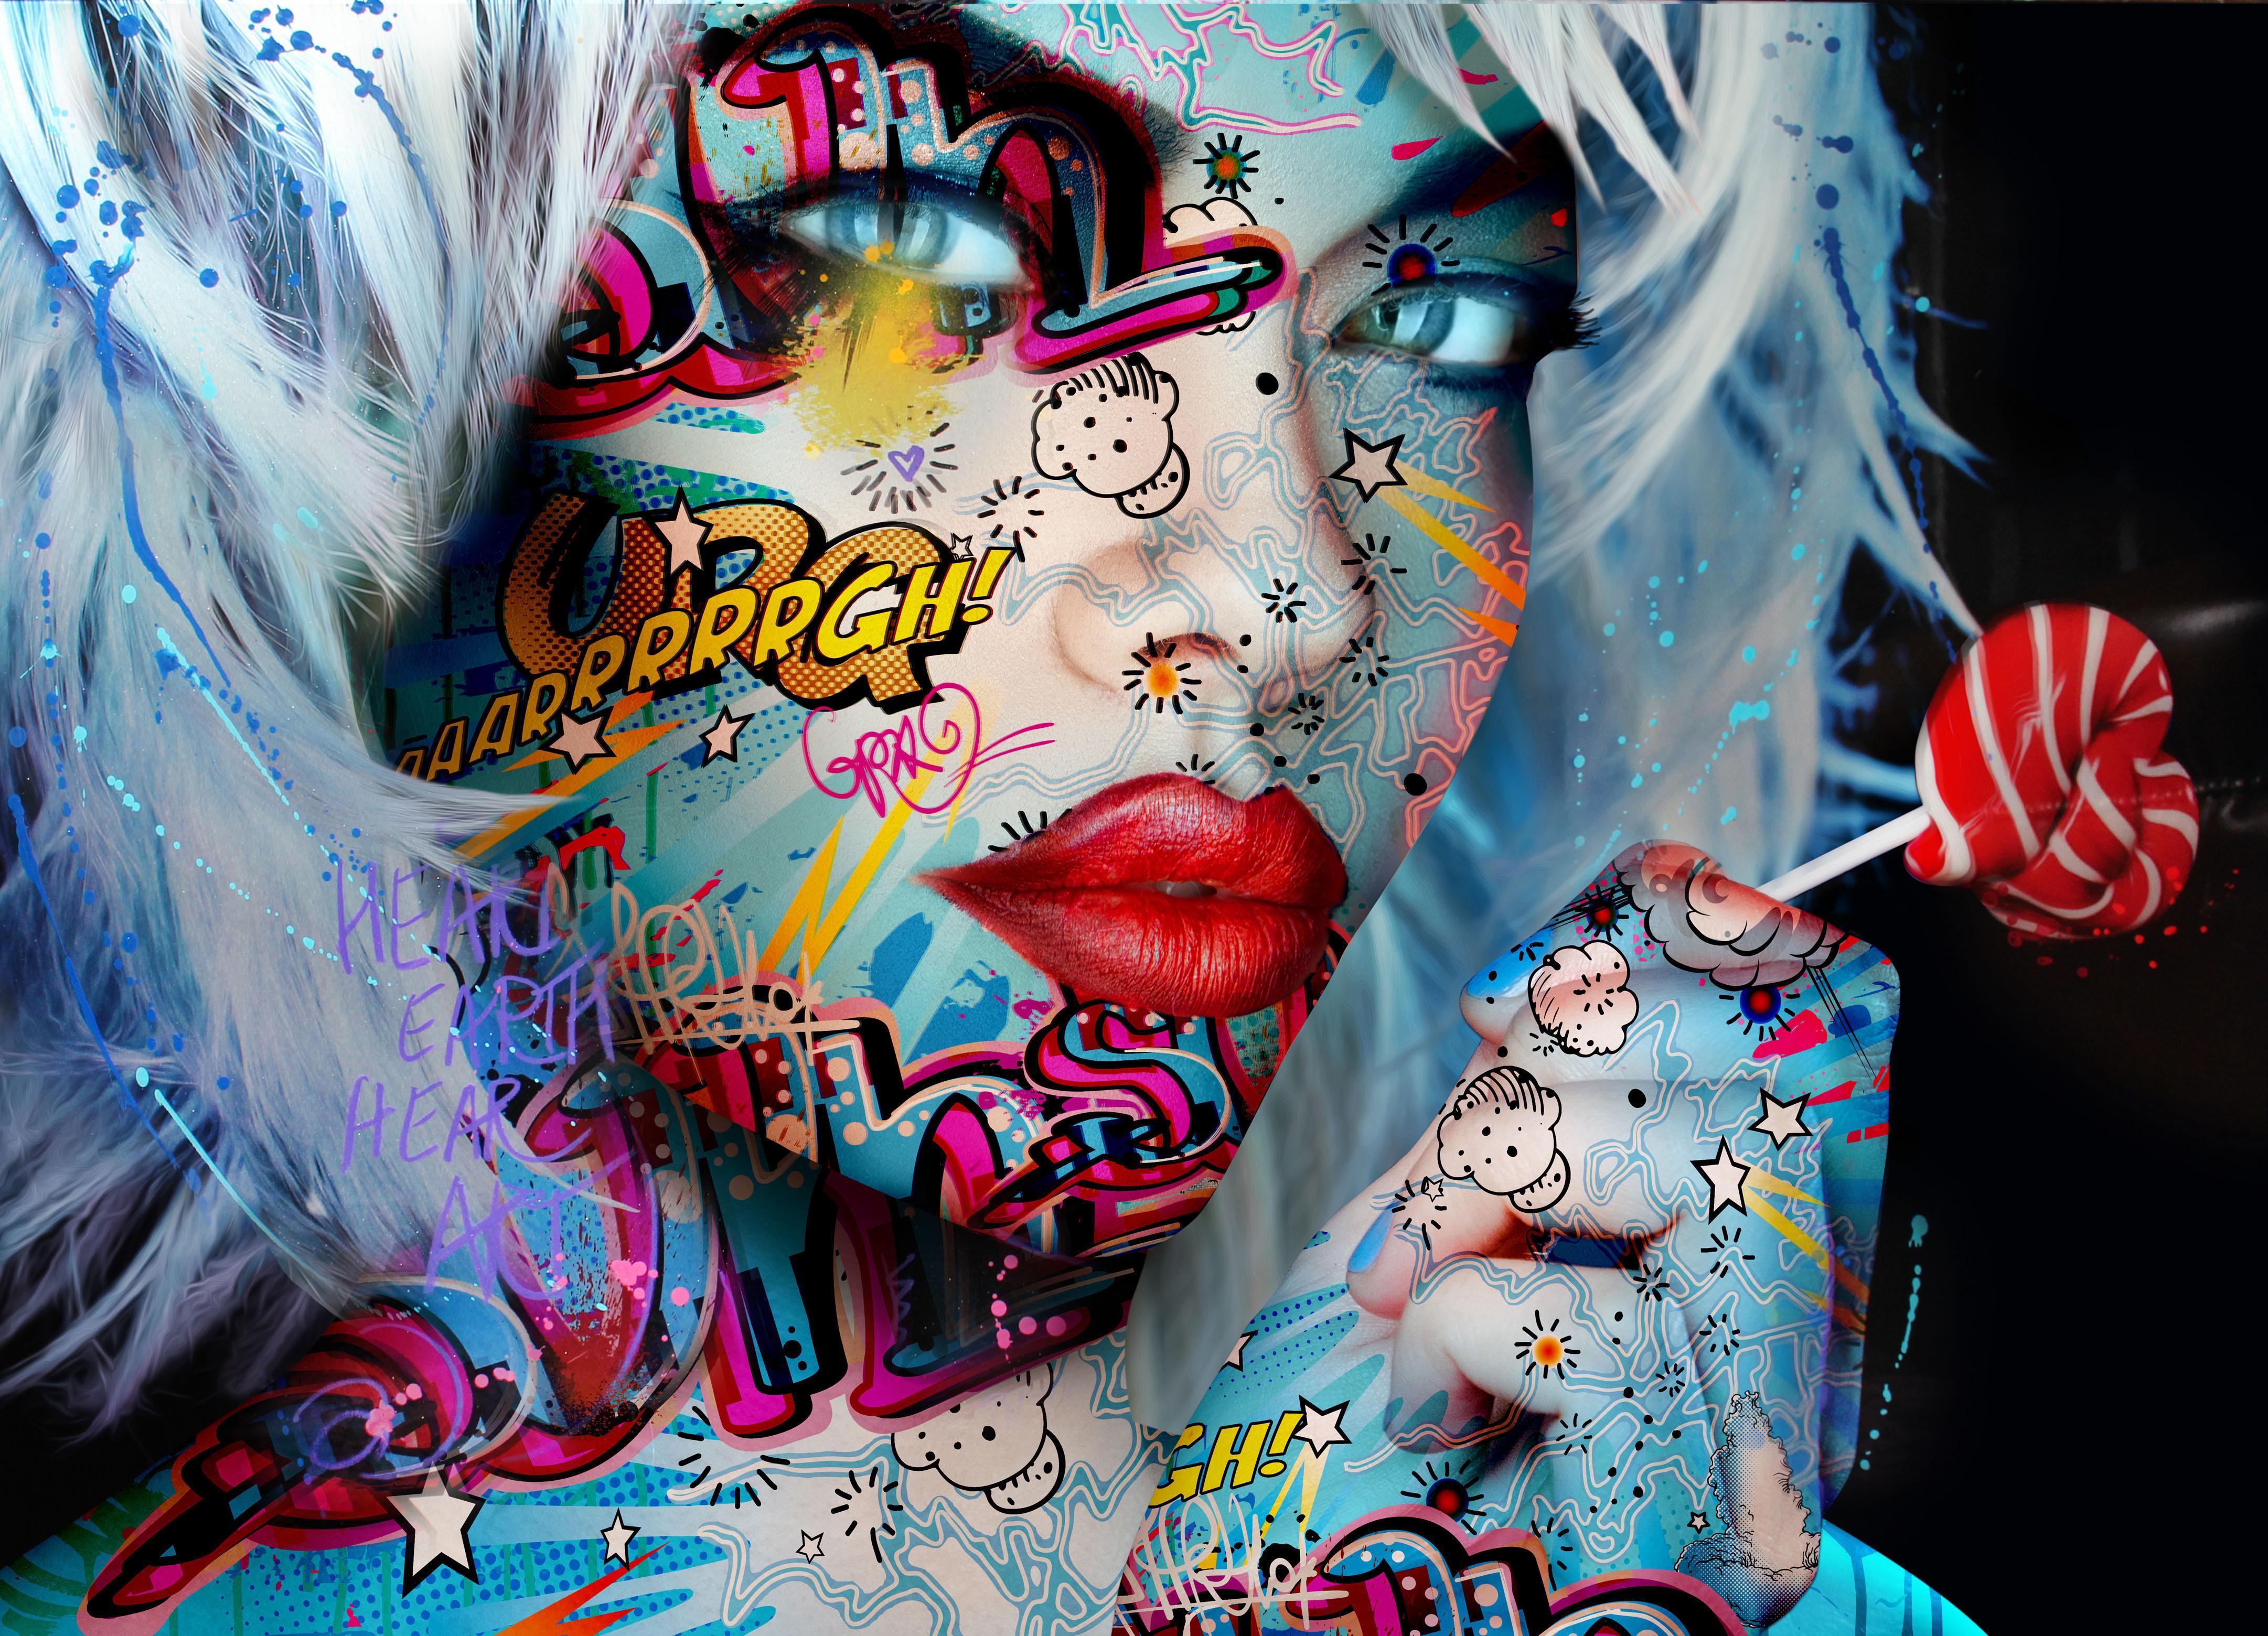 """Candy Yum Yum"" - Pop art, pop culture, feminism, woman power, woman empowerment"